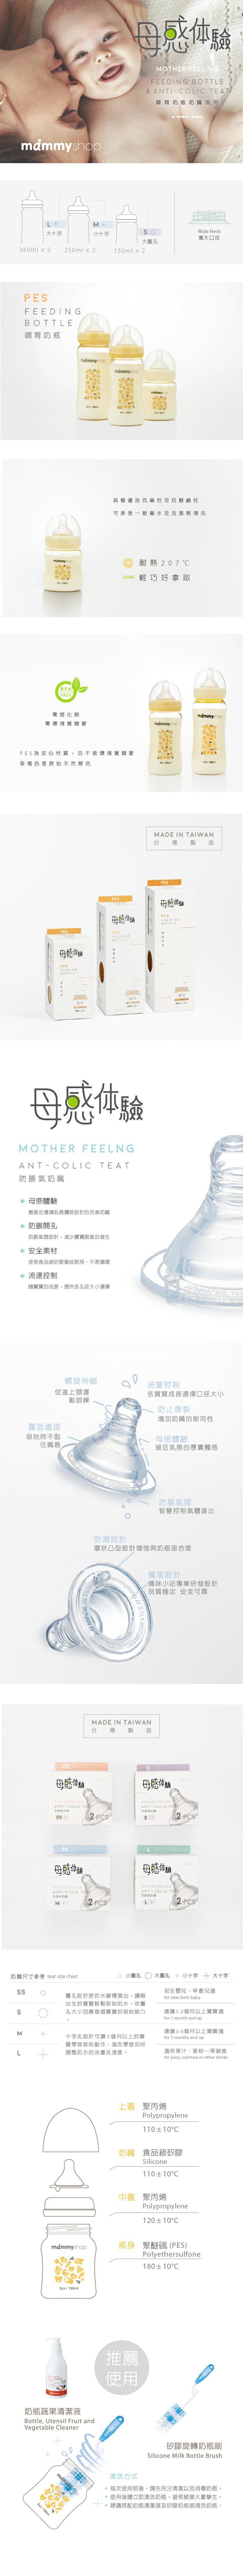 Mammyshop媽咪小站 - 母感體驗 PES防脹氣奶瓶 寬大口徑 360ml/250ml/150ml 各2入 超值組 1